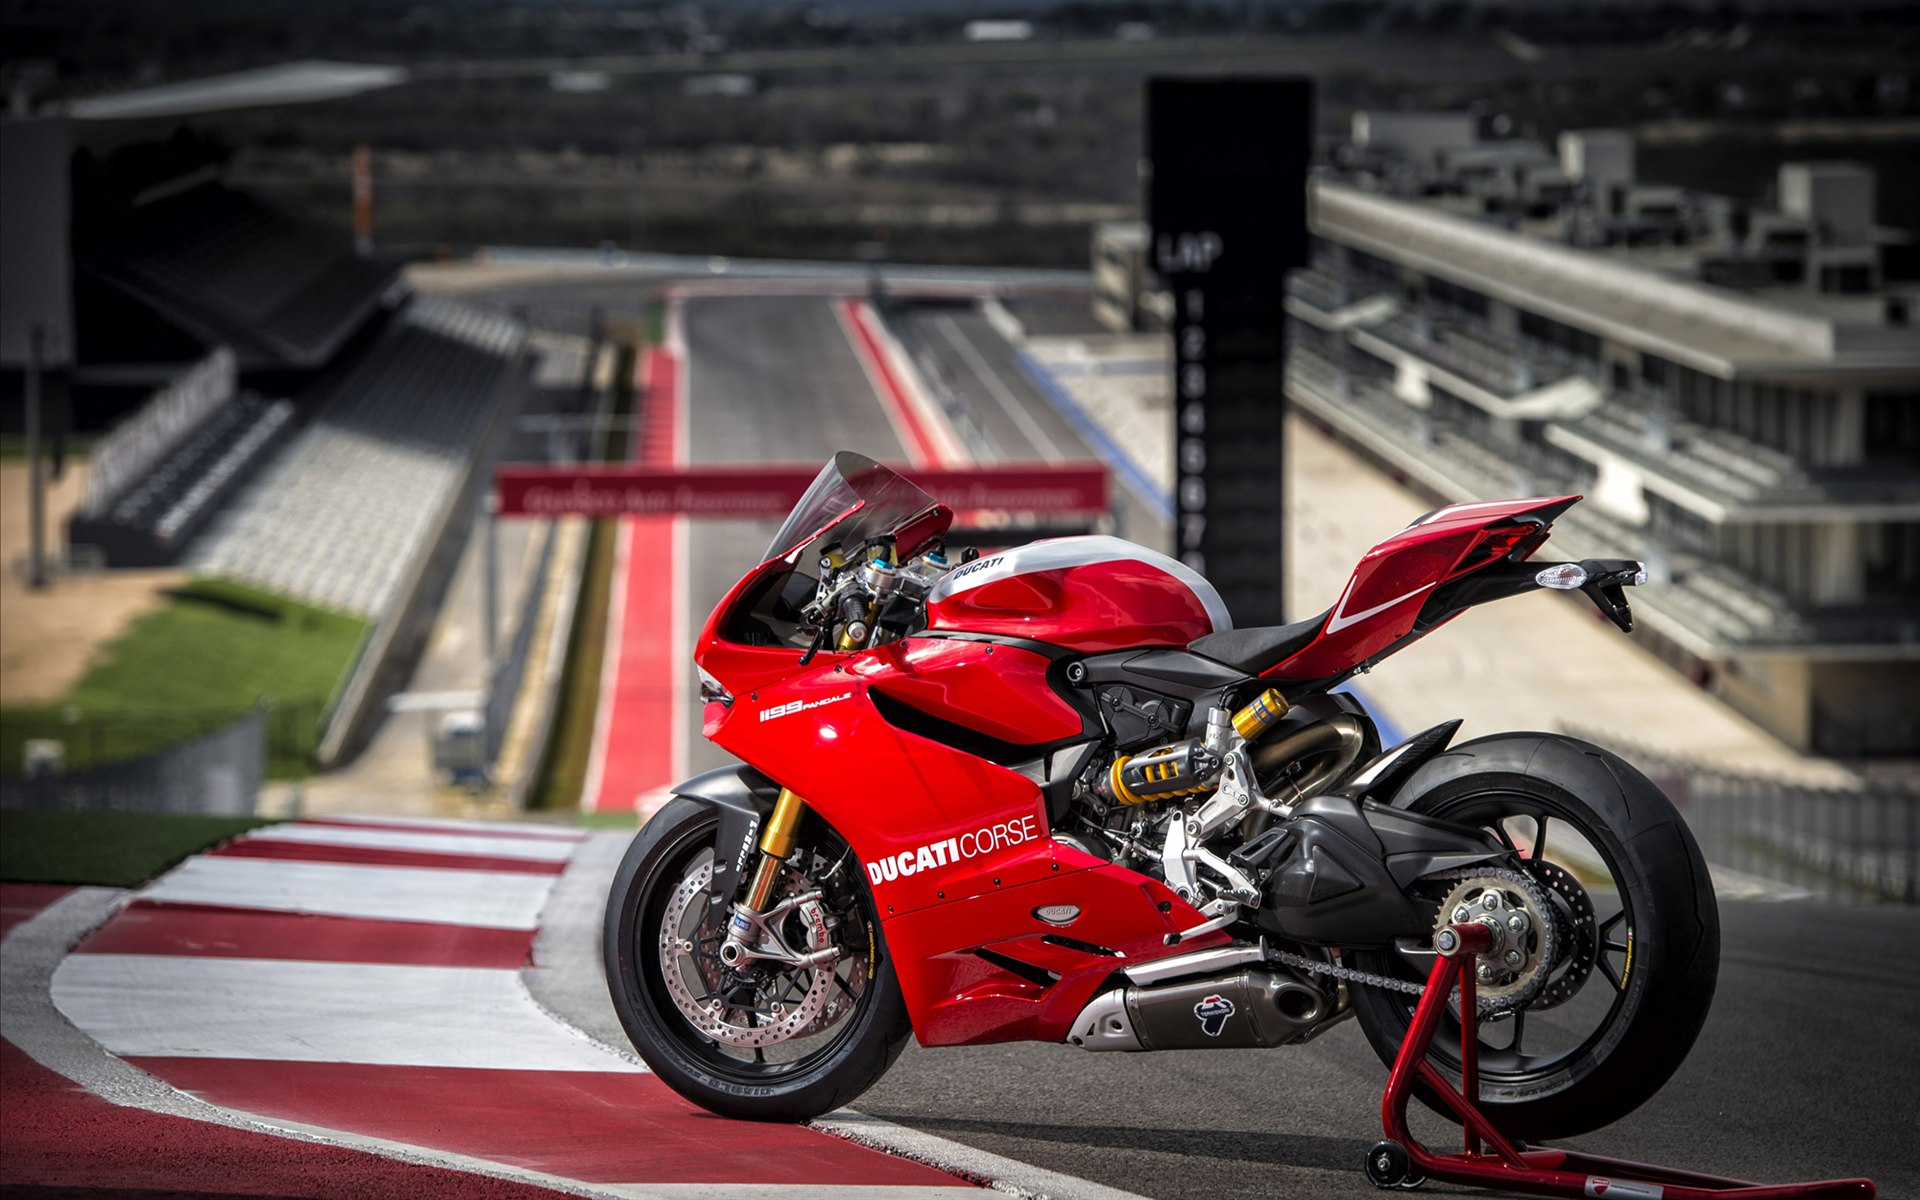 2013 Ducati Superbike 1199 Panigale R Ducati Panigale